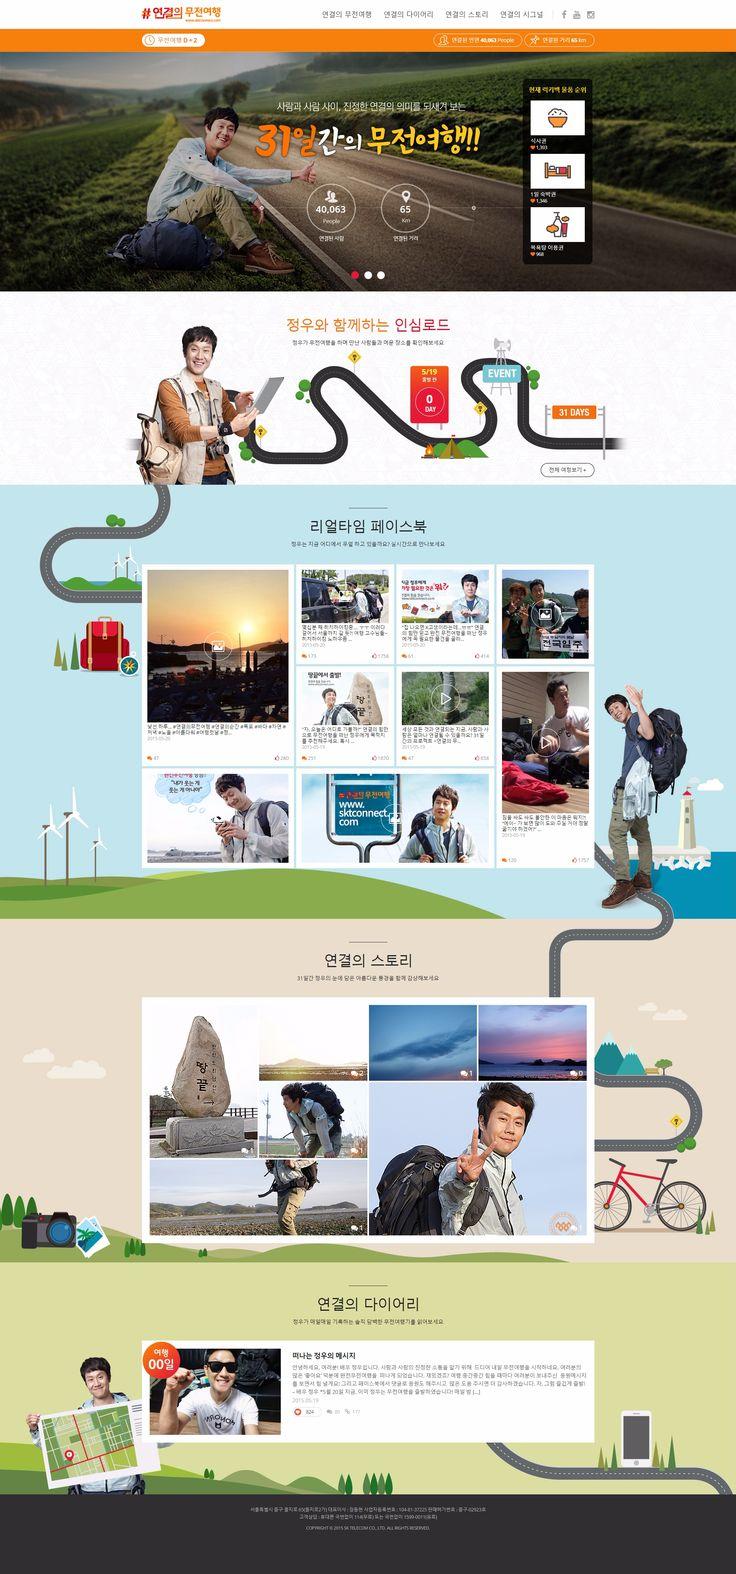 SK Telecom / event / web / 연결의 무전 여행 / 정우